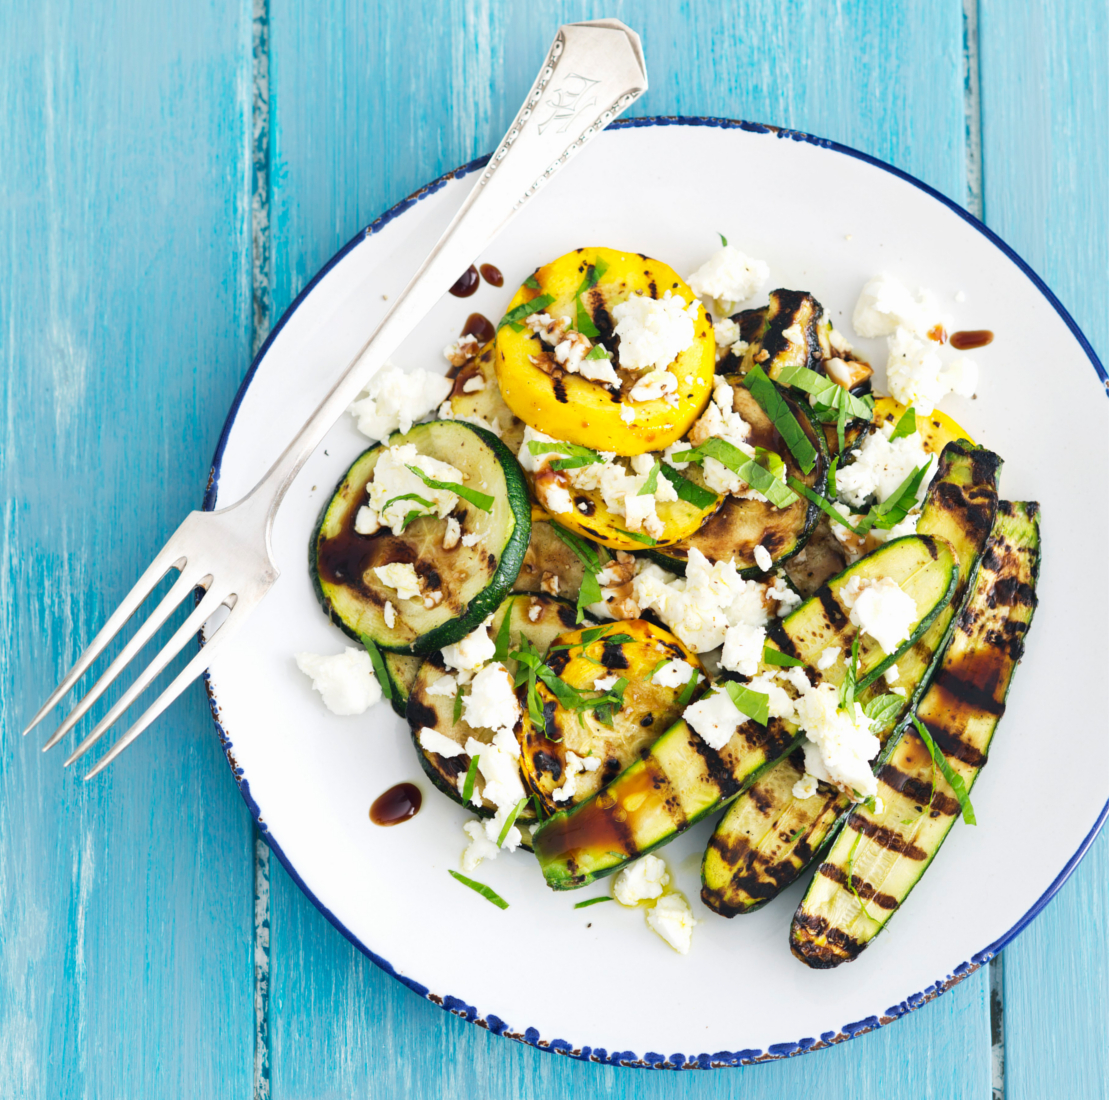 westwing-sommer-rezepte-zucchini-mit-feta